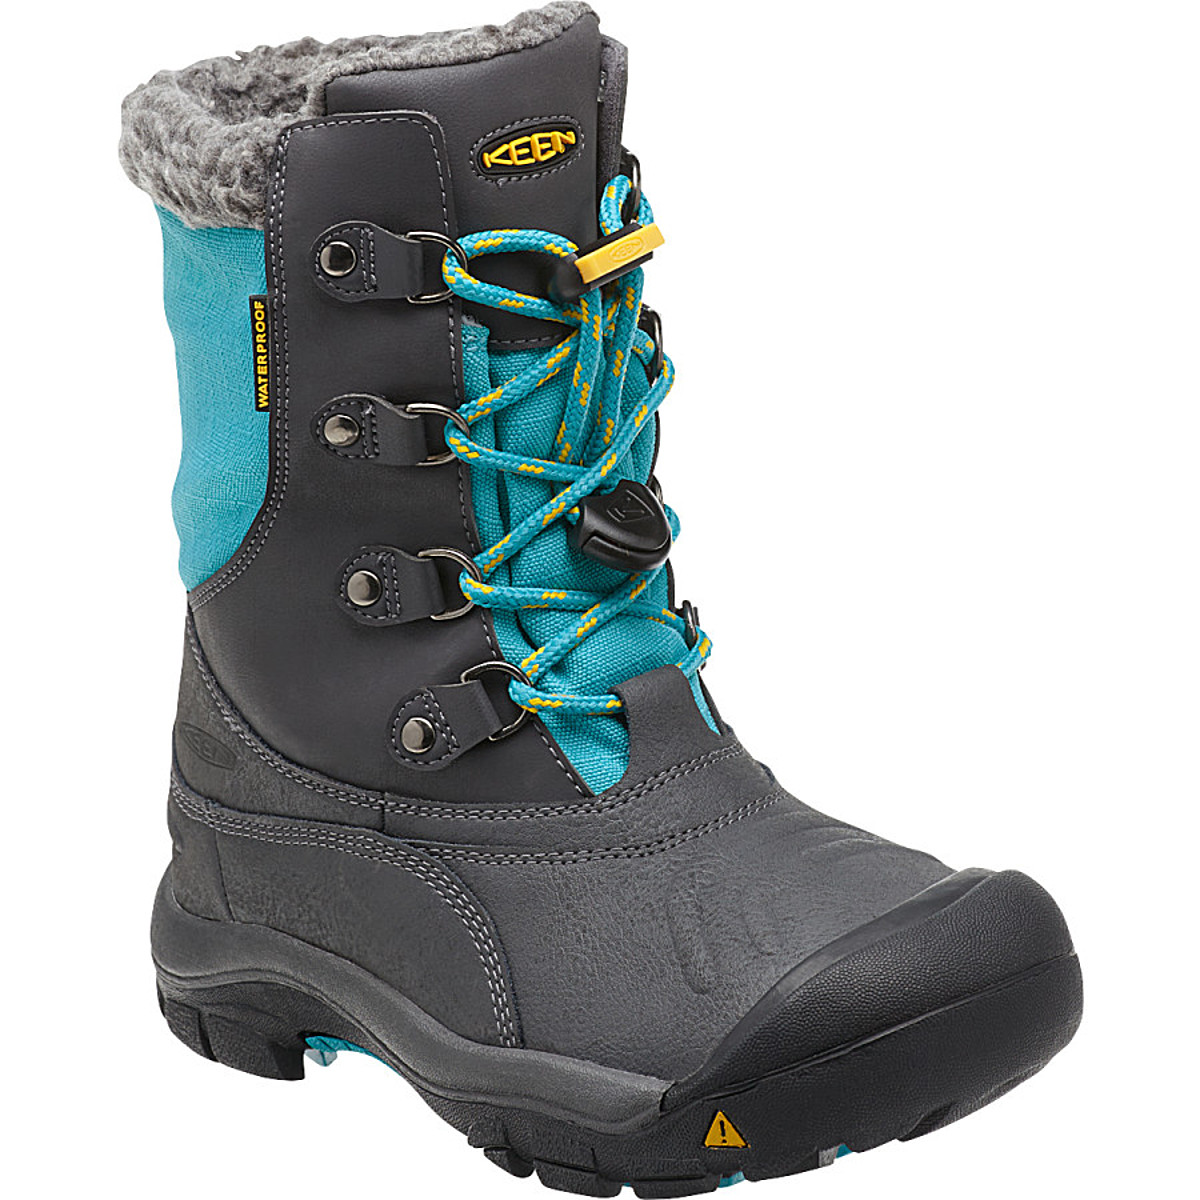 Keen Basin WP Boots